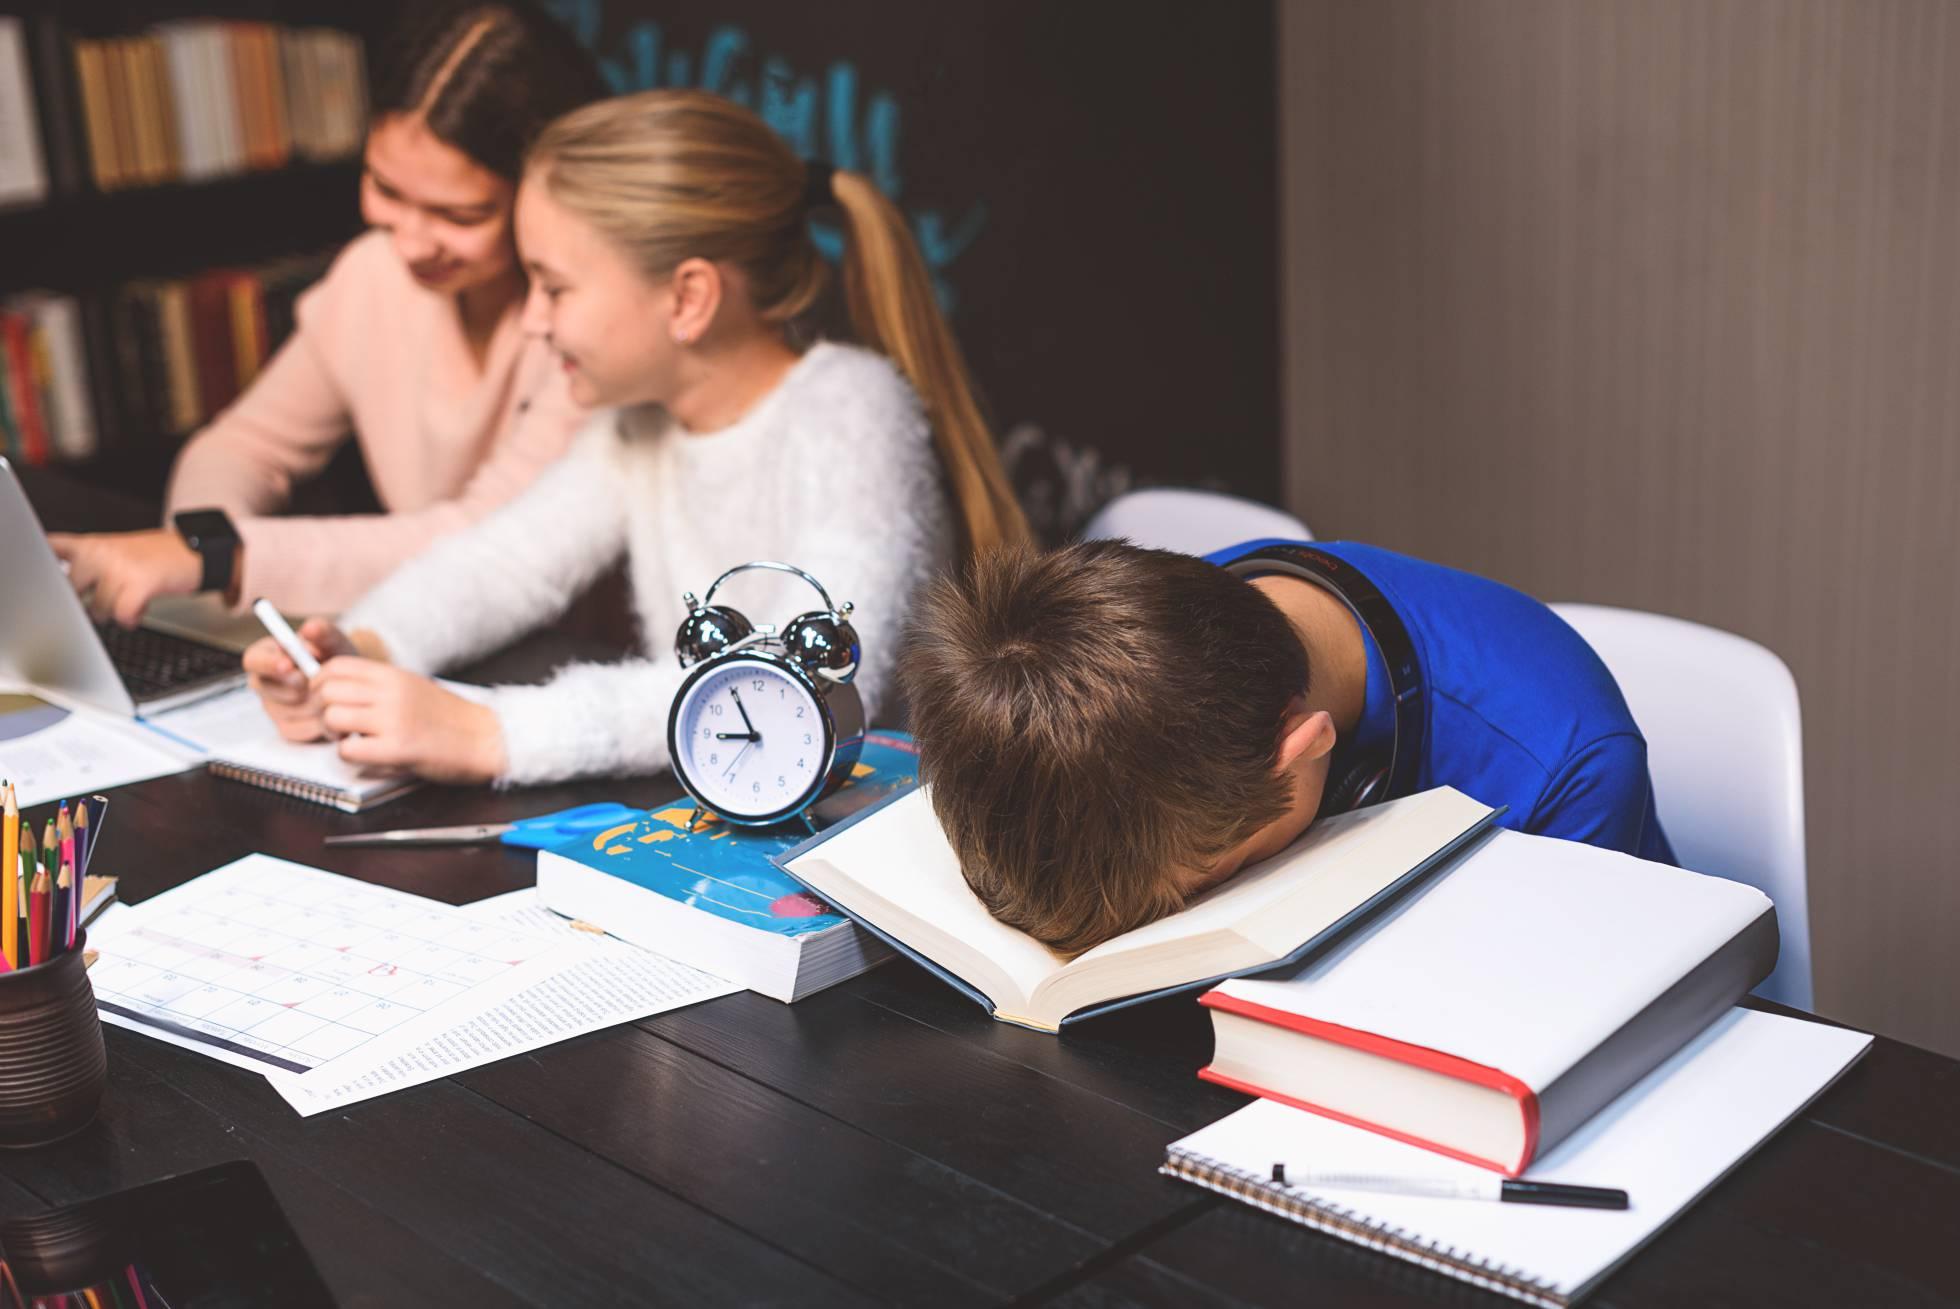 Как раннее время начала занятий в испанских школах влияет на самочувствие учеников?